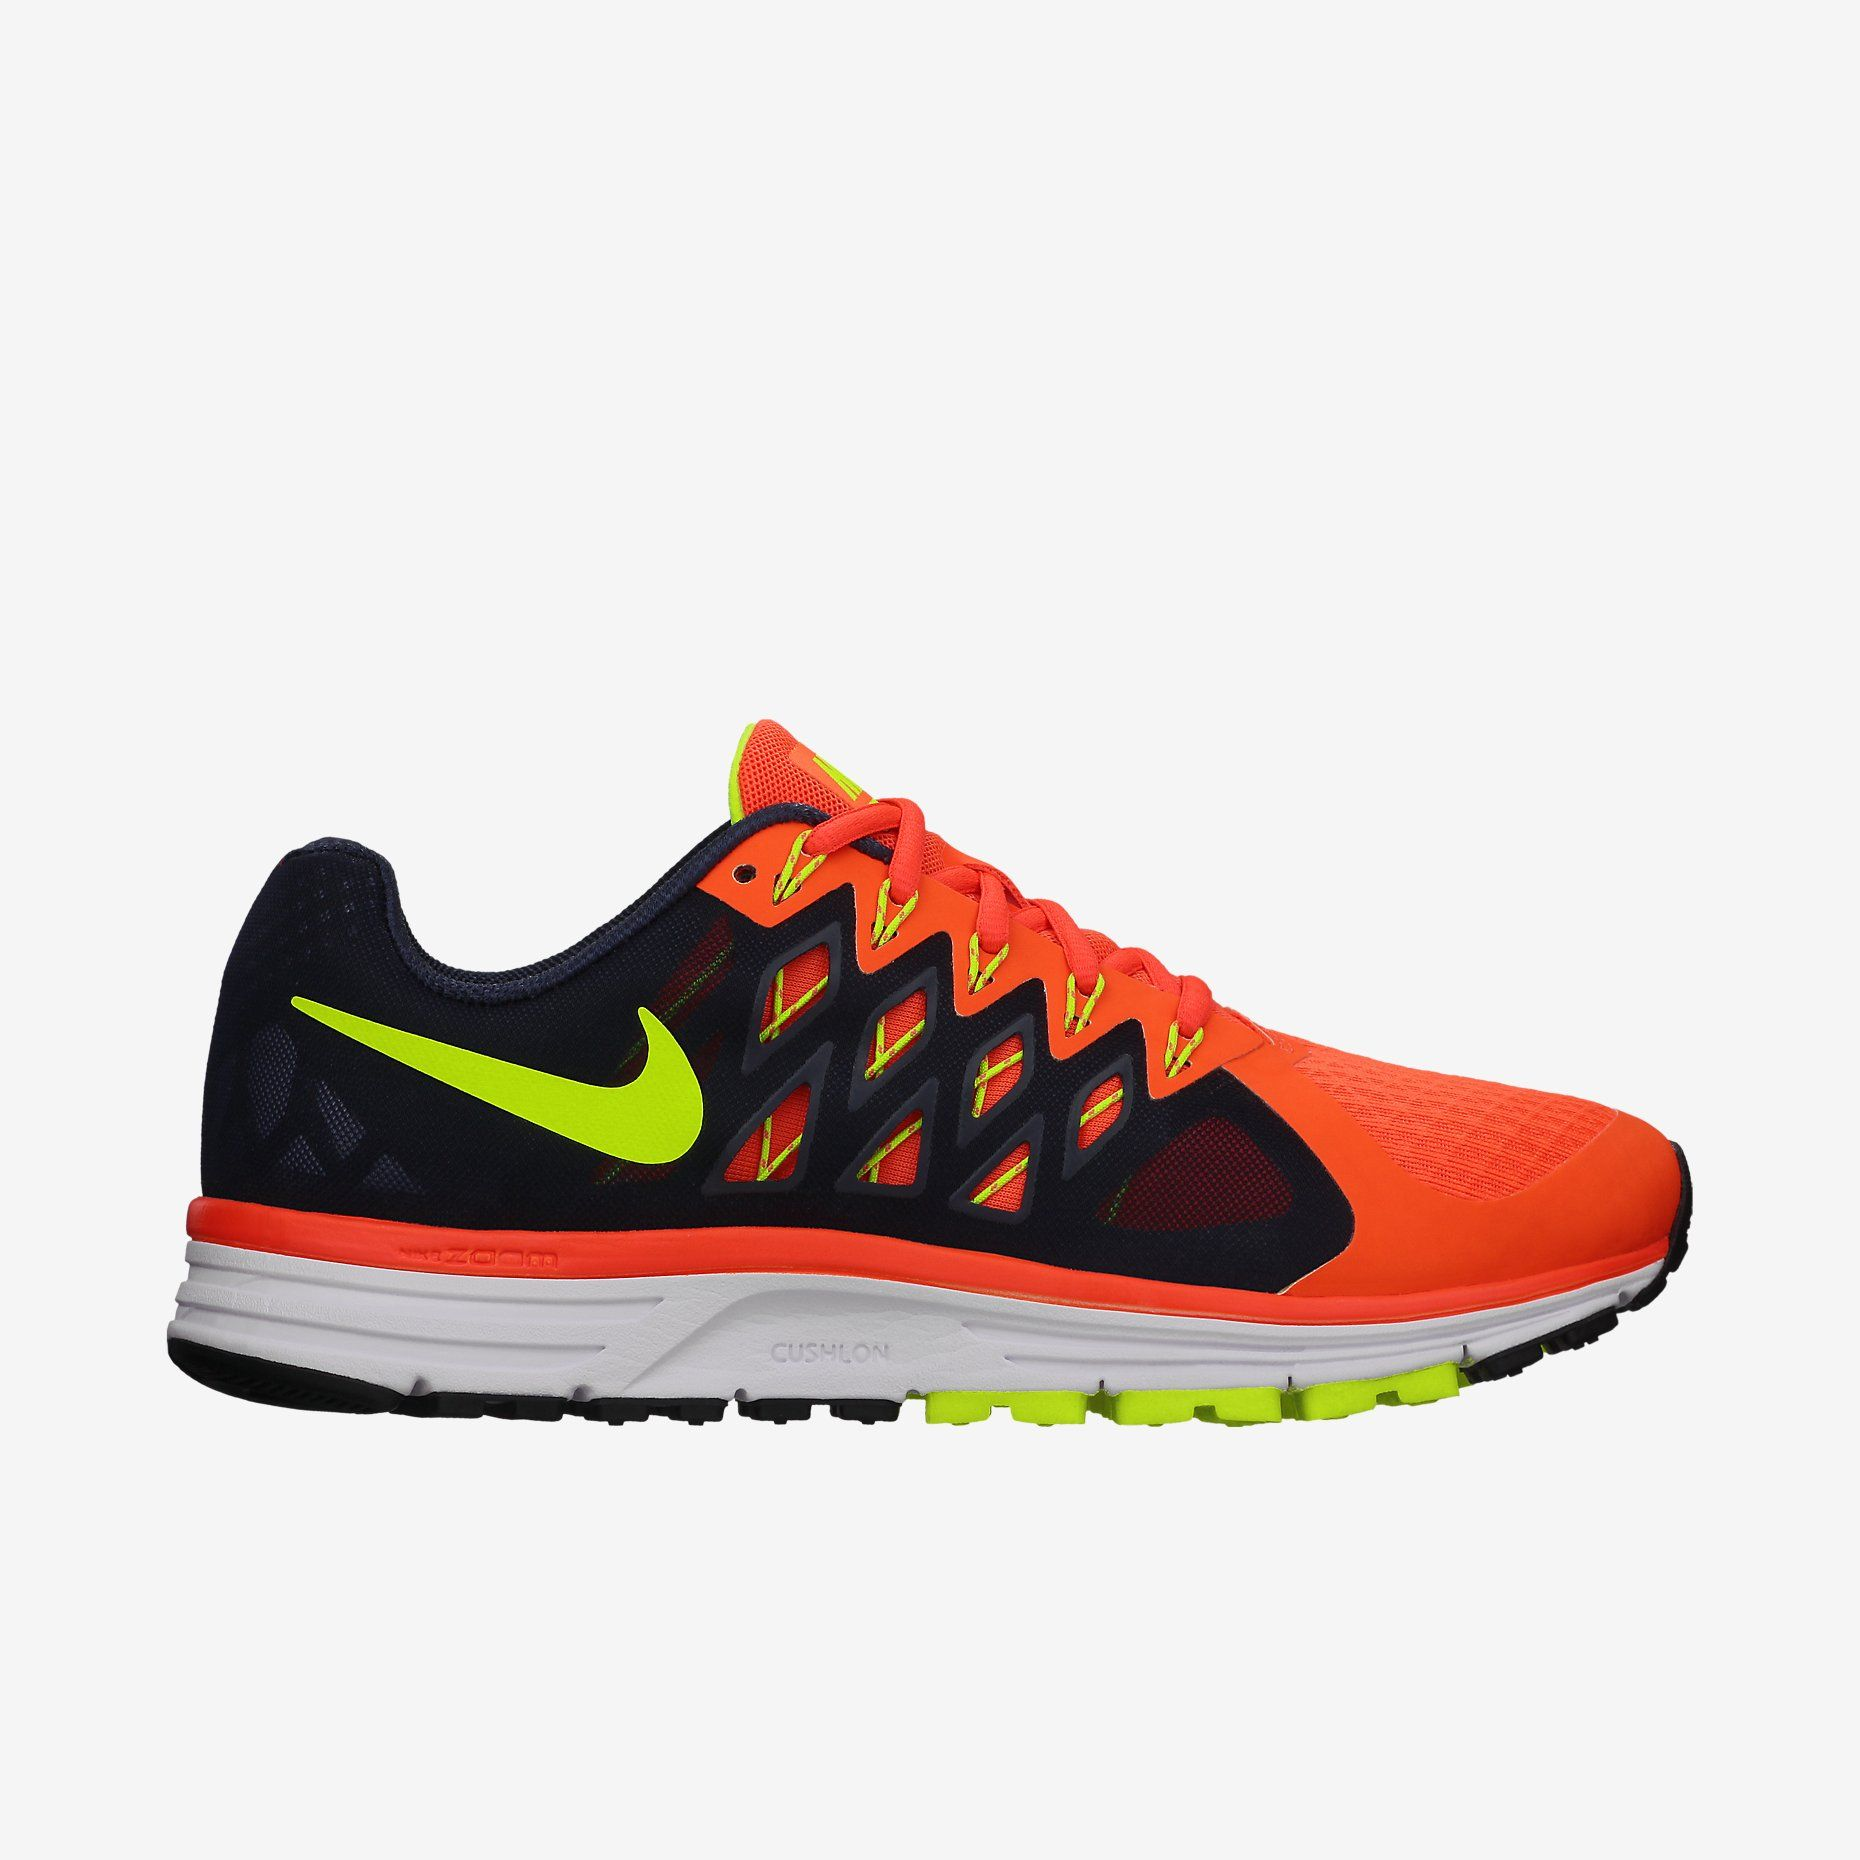 pretty nice f5233 7ec5b ... wholesale nike air zoom vomero 9 mens running shoe. 5c1a1 0a9ab